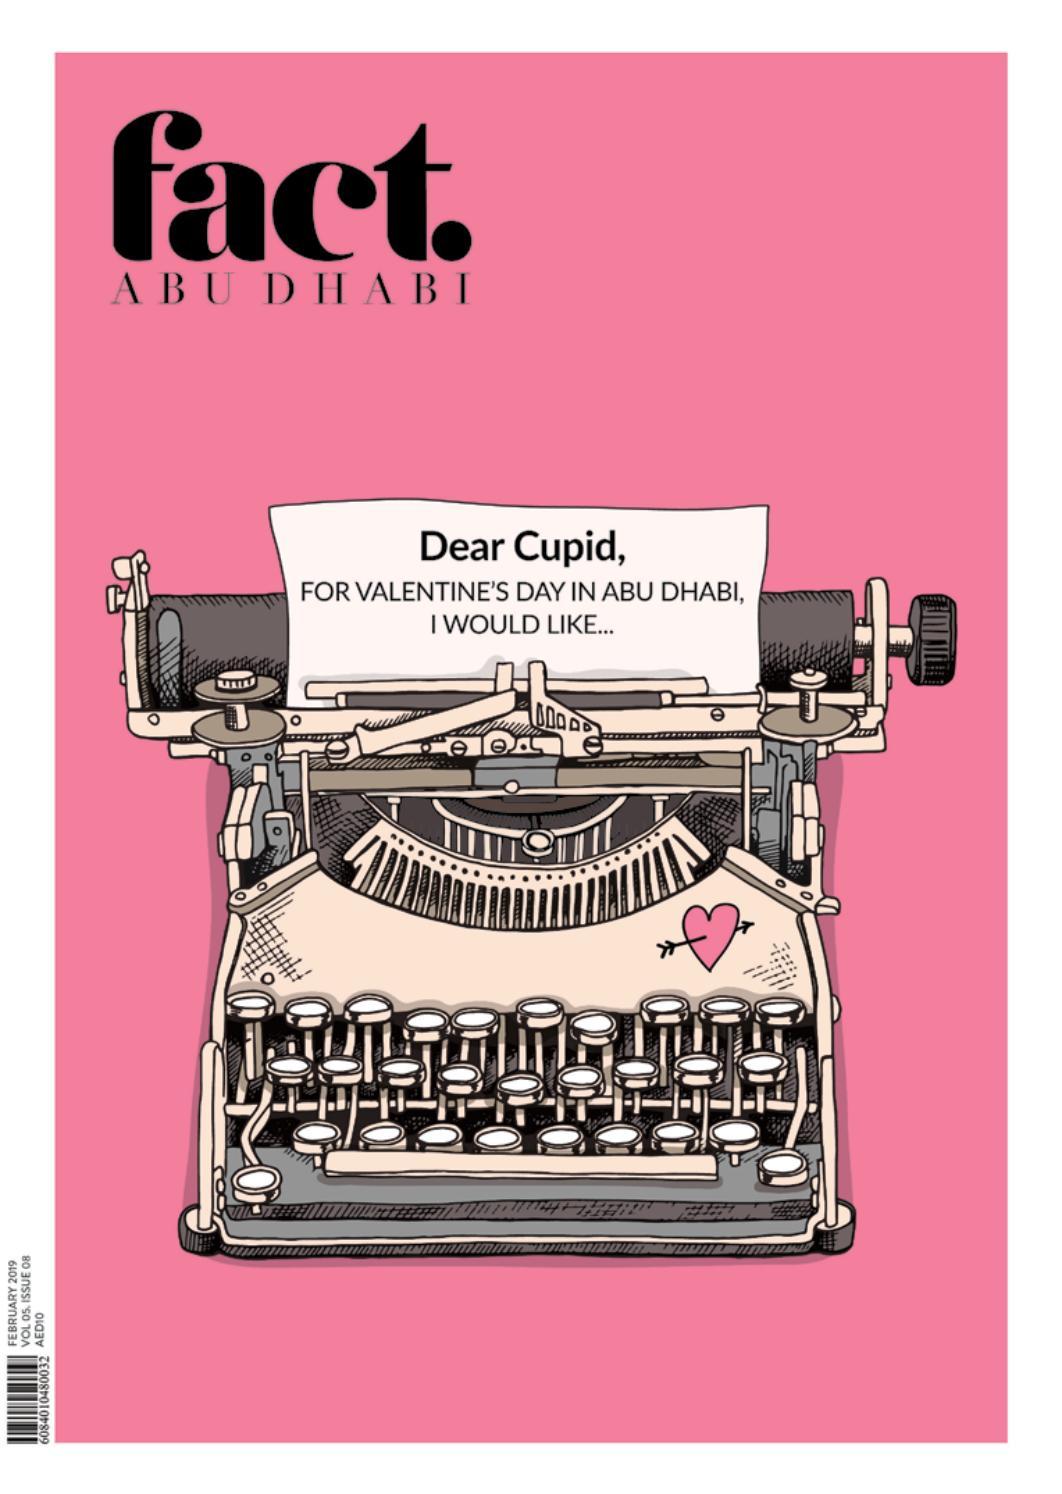 8fcc99e8937 FACT Abu Dhabi February 2019 by Fact Magazine - issuu